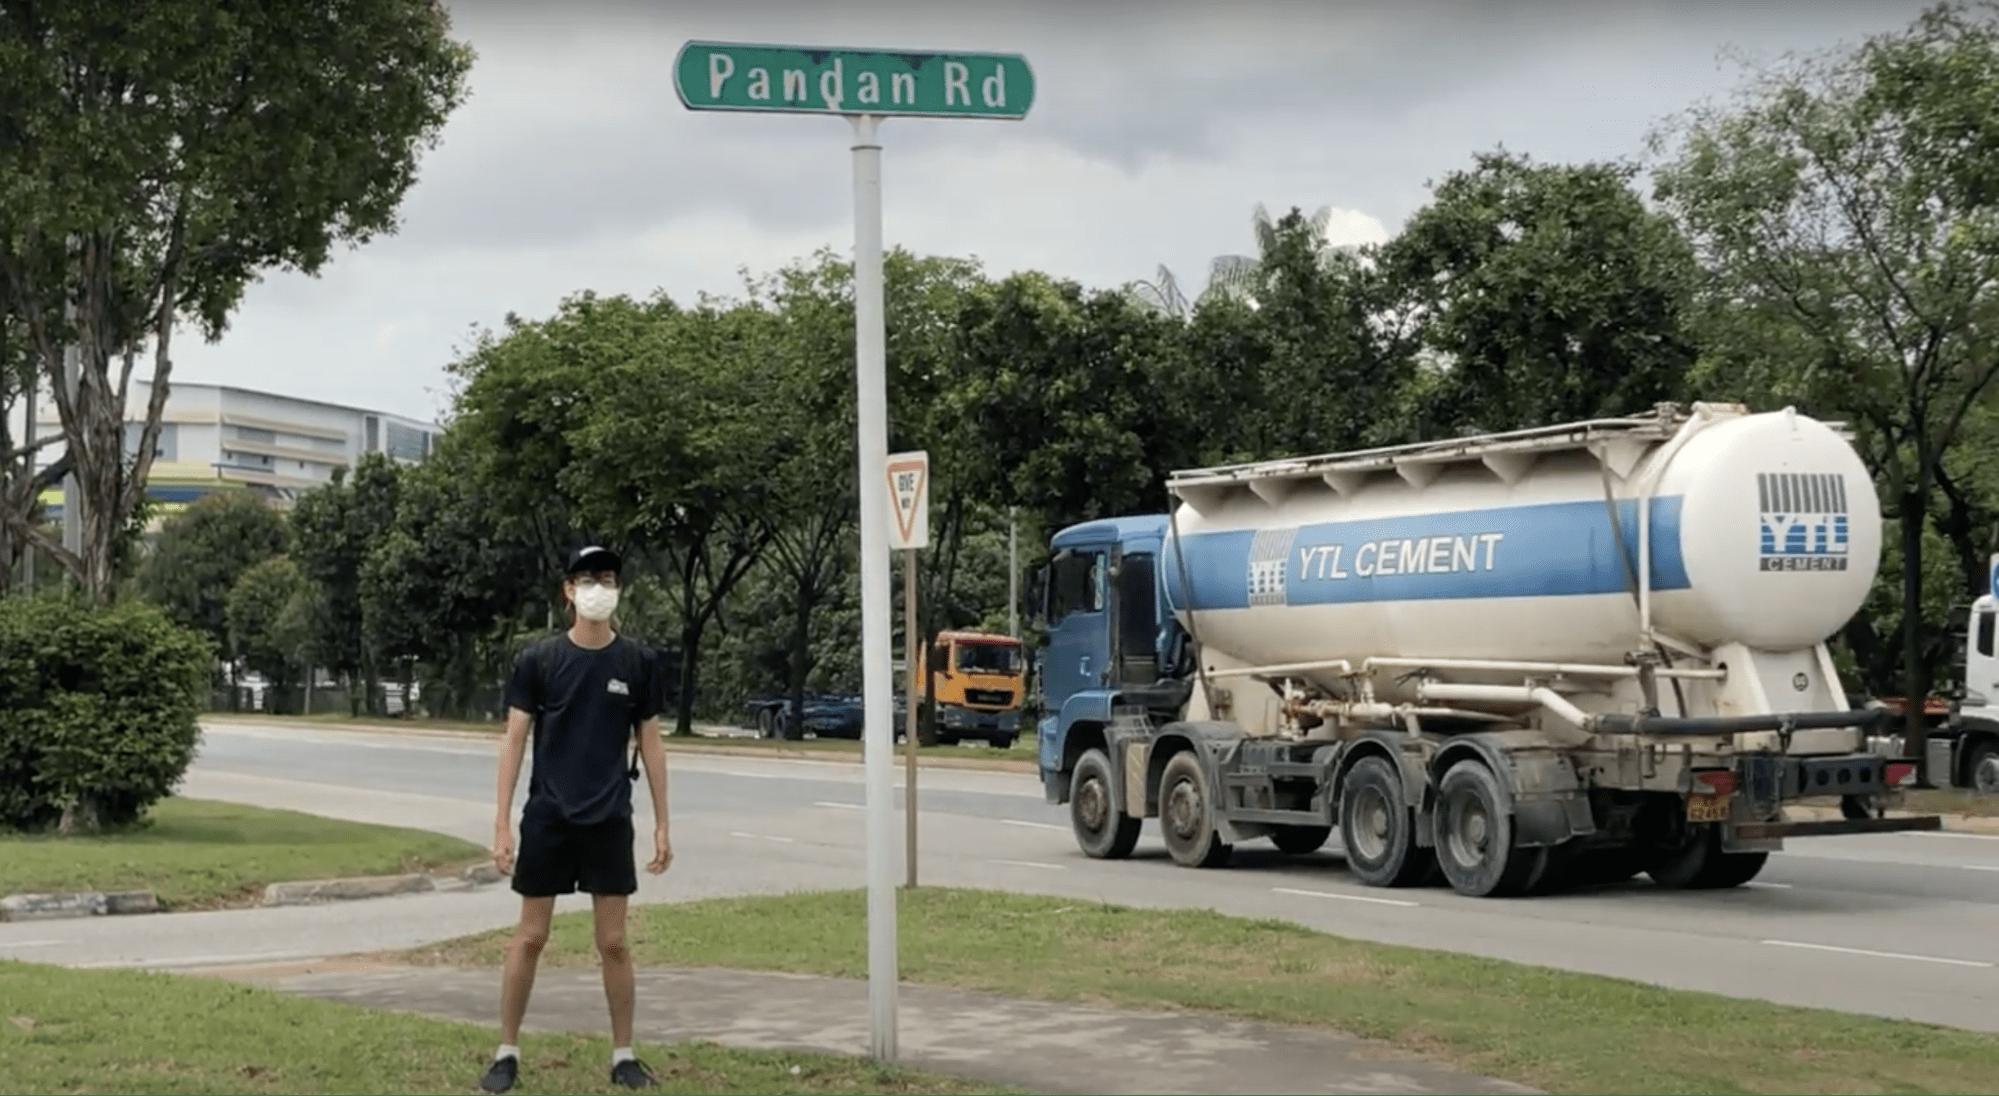 pandan road